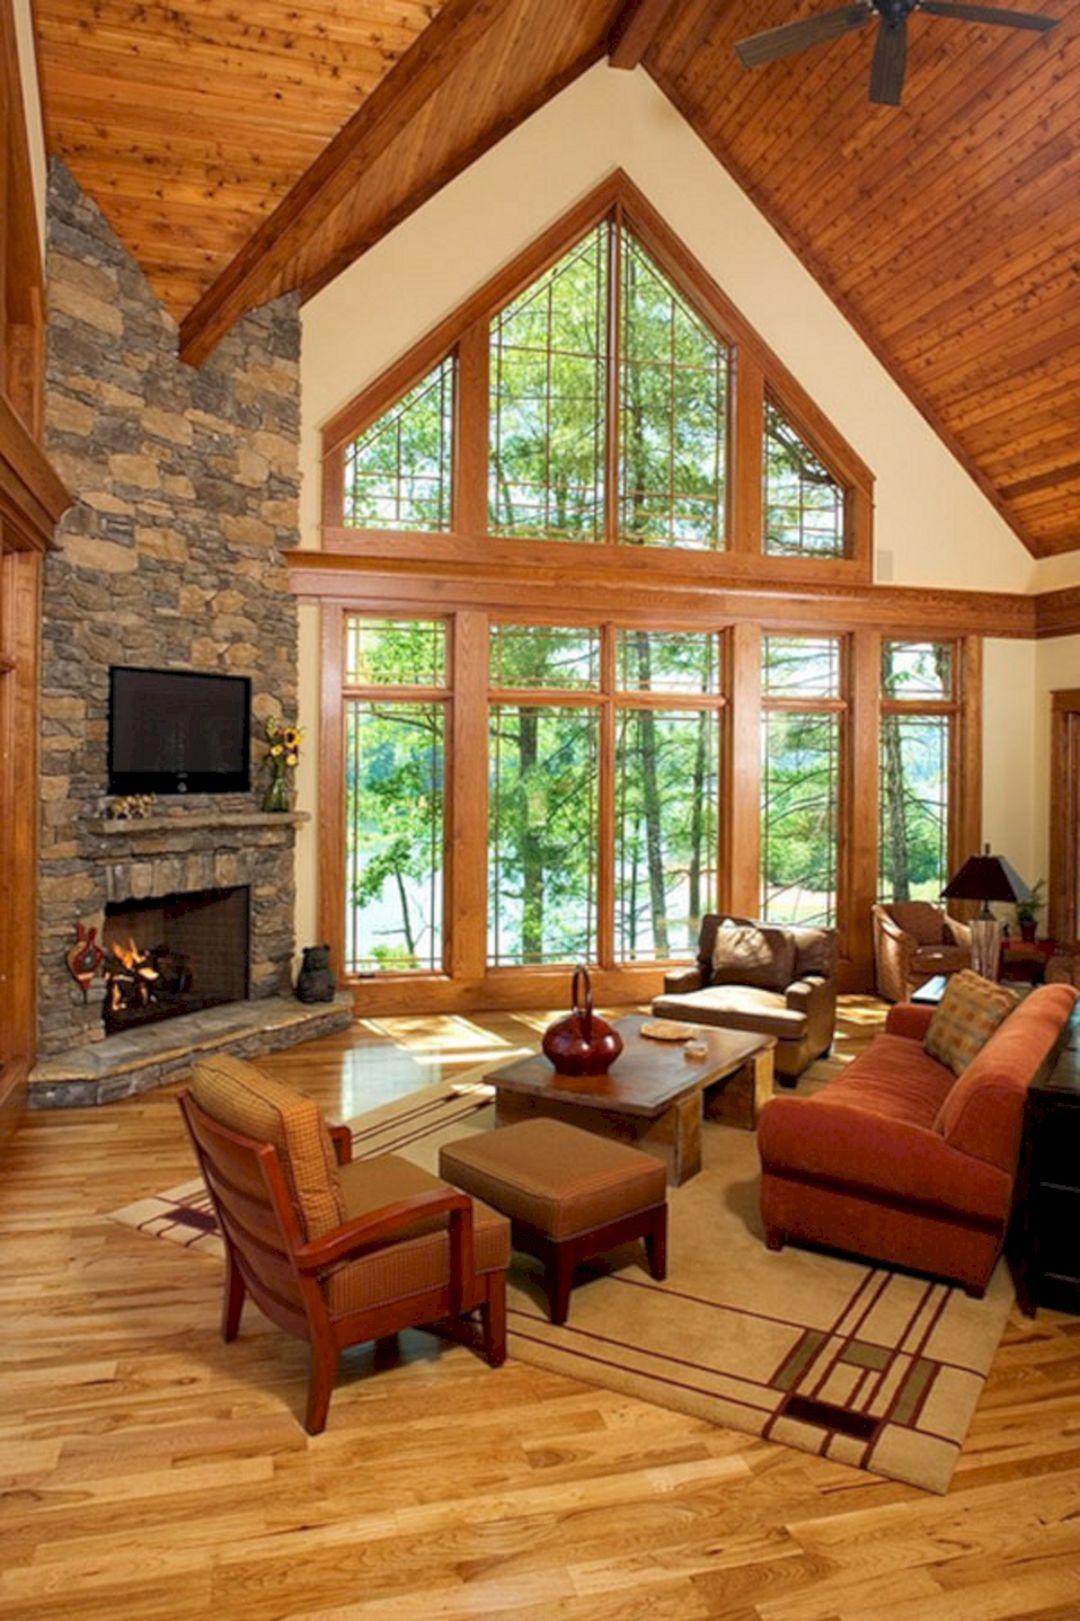 49 Superb Cozy And Rustic Cabin Style Living Rooms Ideas Freshouz Com Rustic Living Room Design Cabin Style Cabin Style Furniture